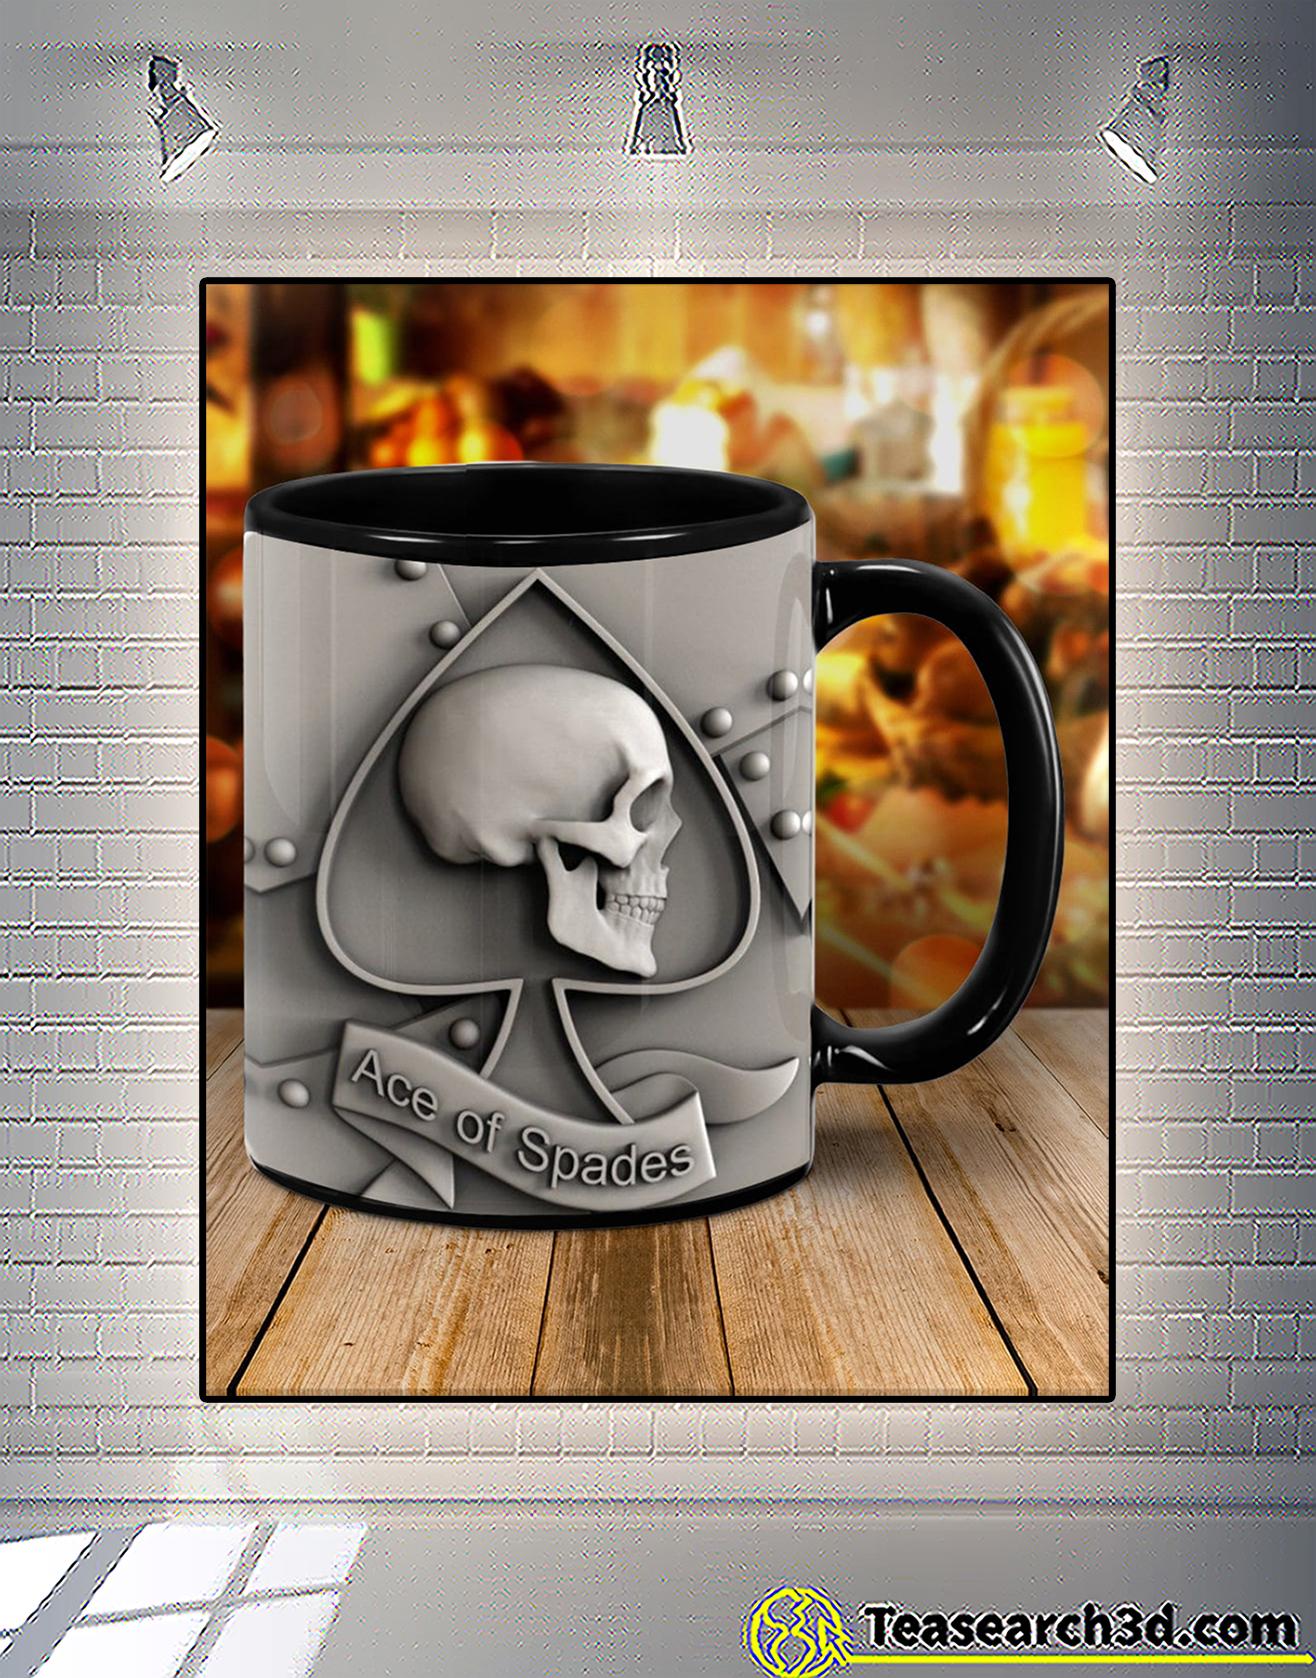 Skull hearts ace of spades mug 2